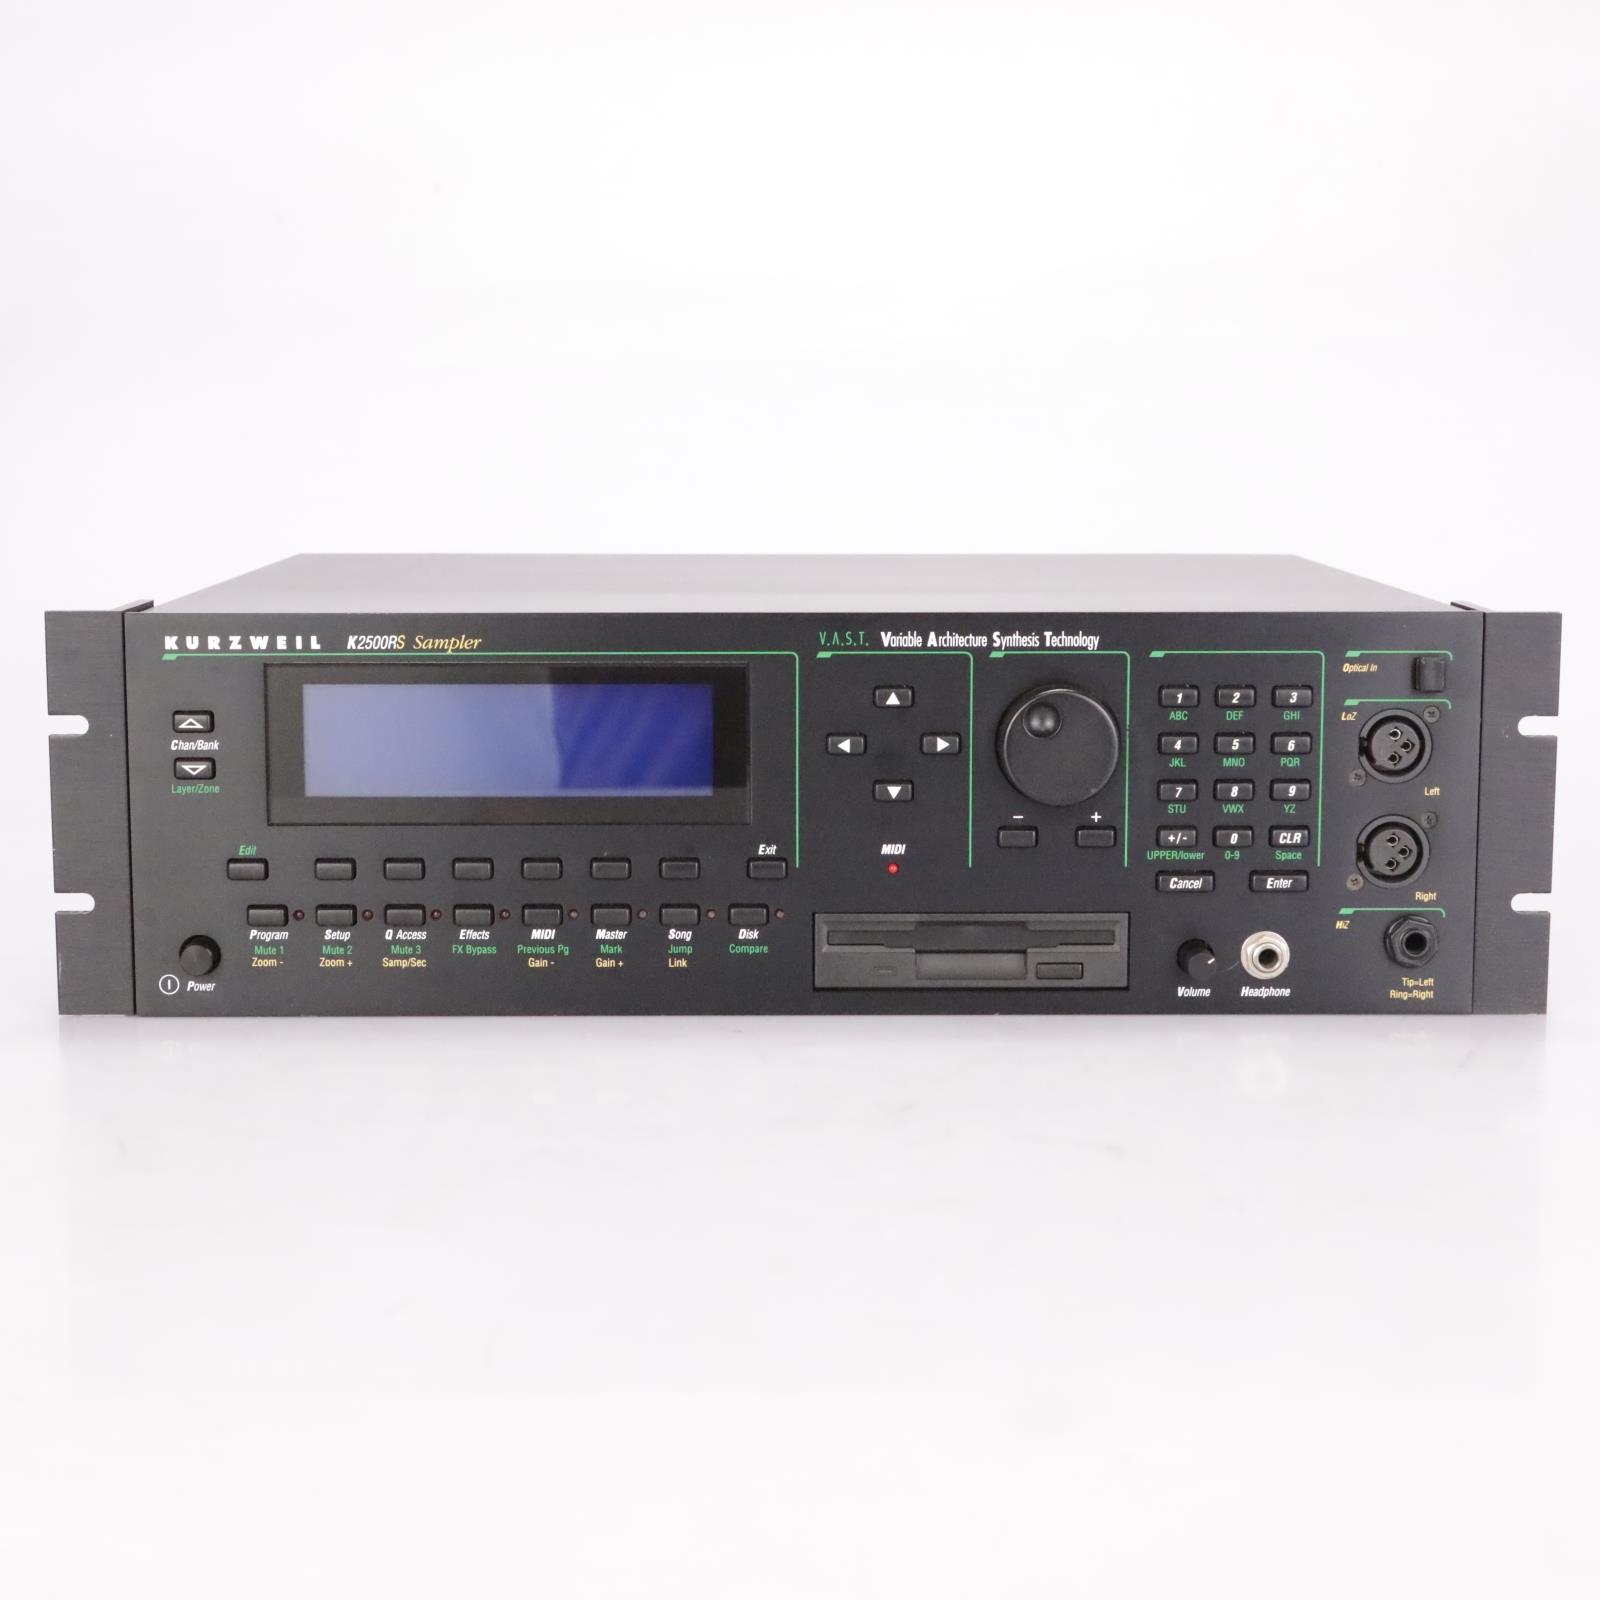 Kurzweil K2500RS Sampler Synthesizer MIDI Sound Module #37373